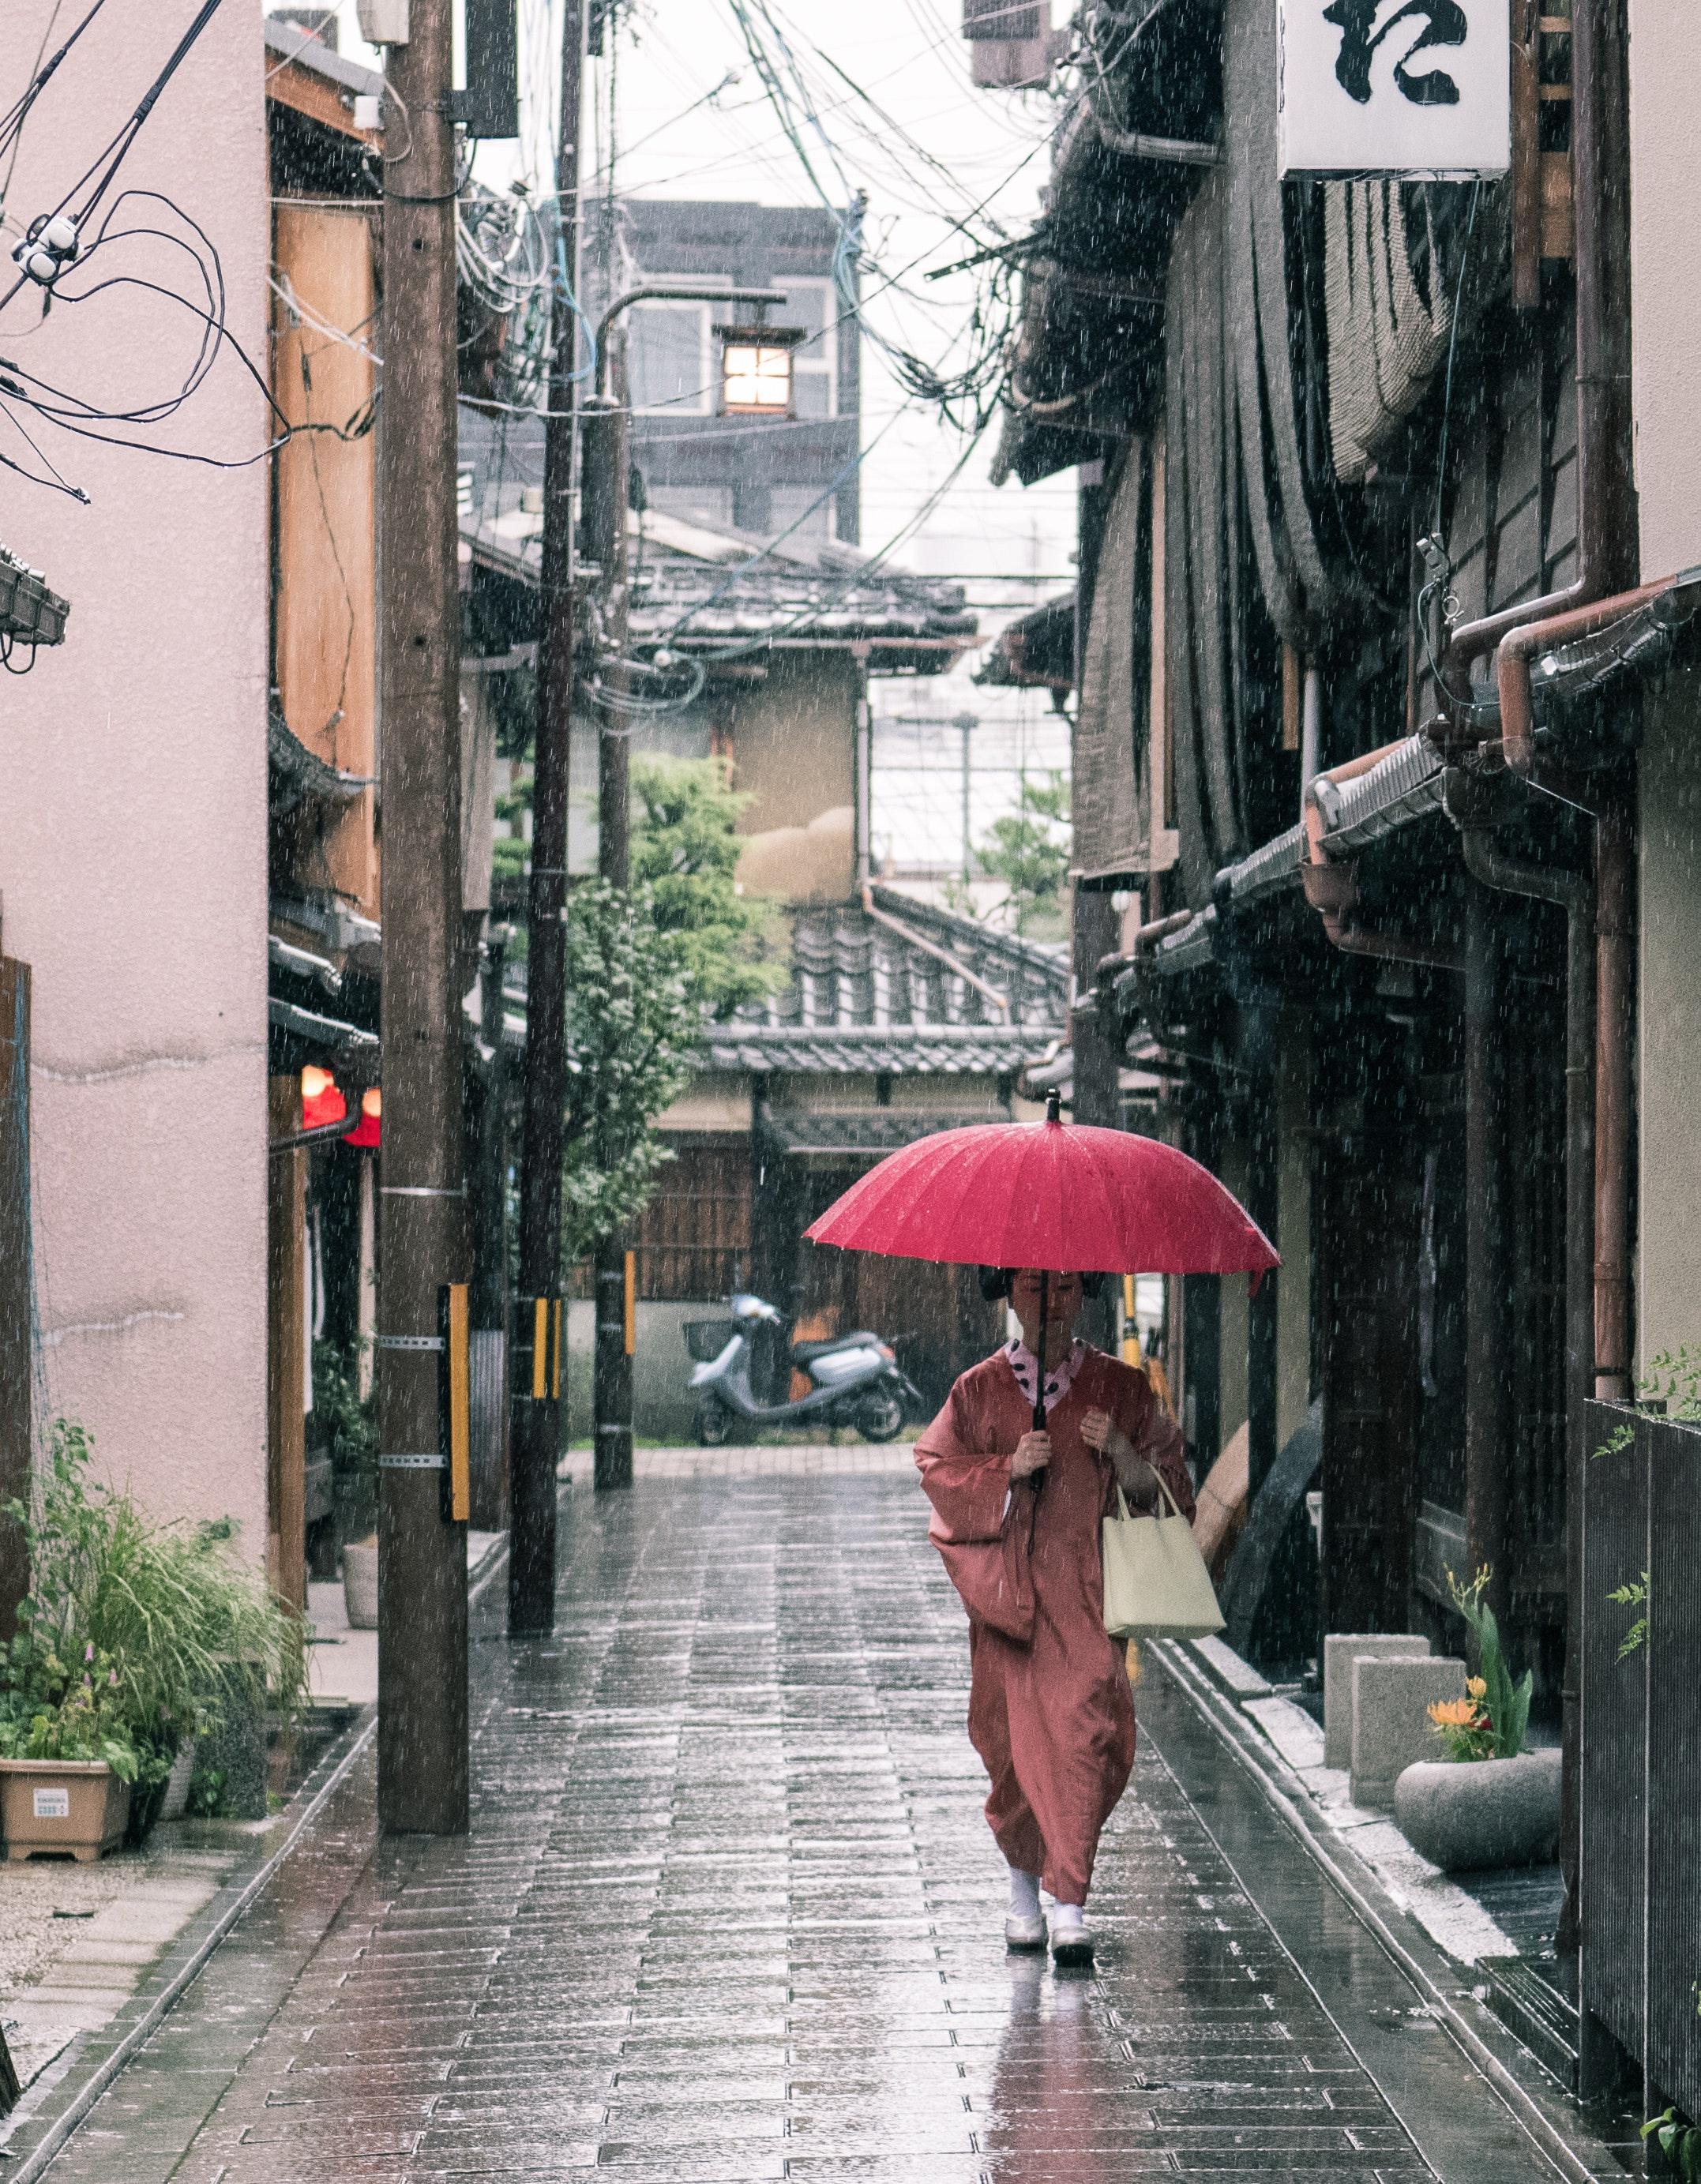 Photo by   Satoshi Hirayama   from   Pexels